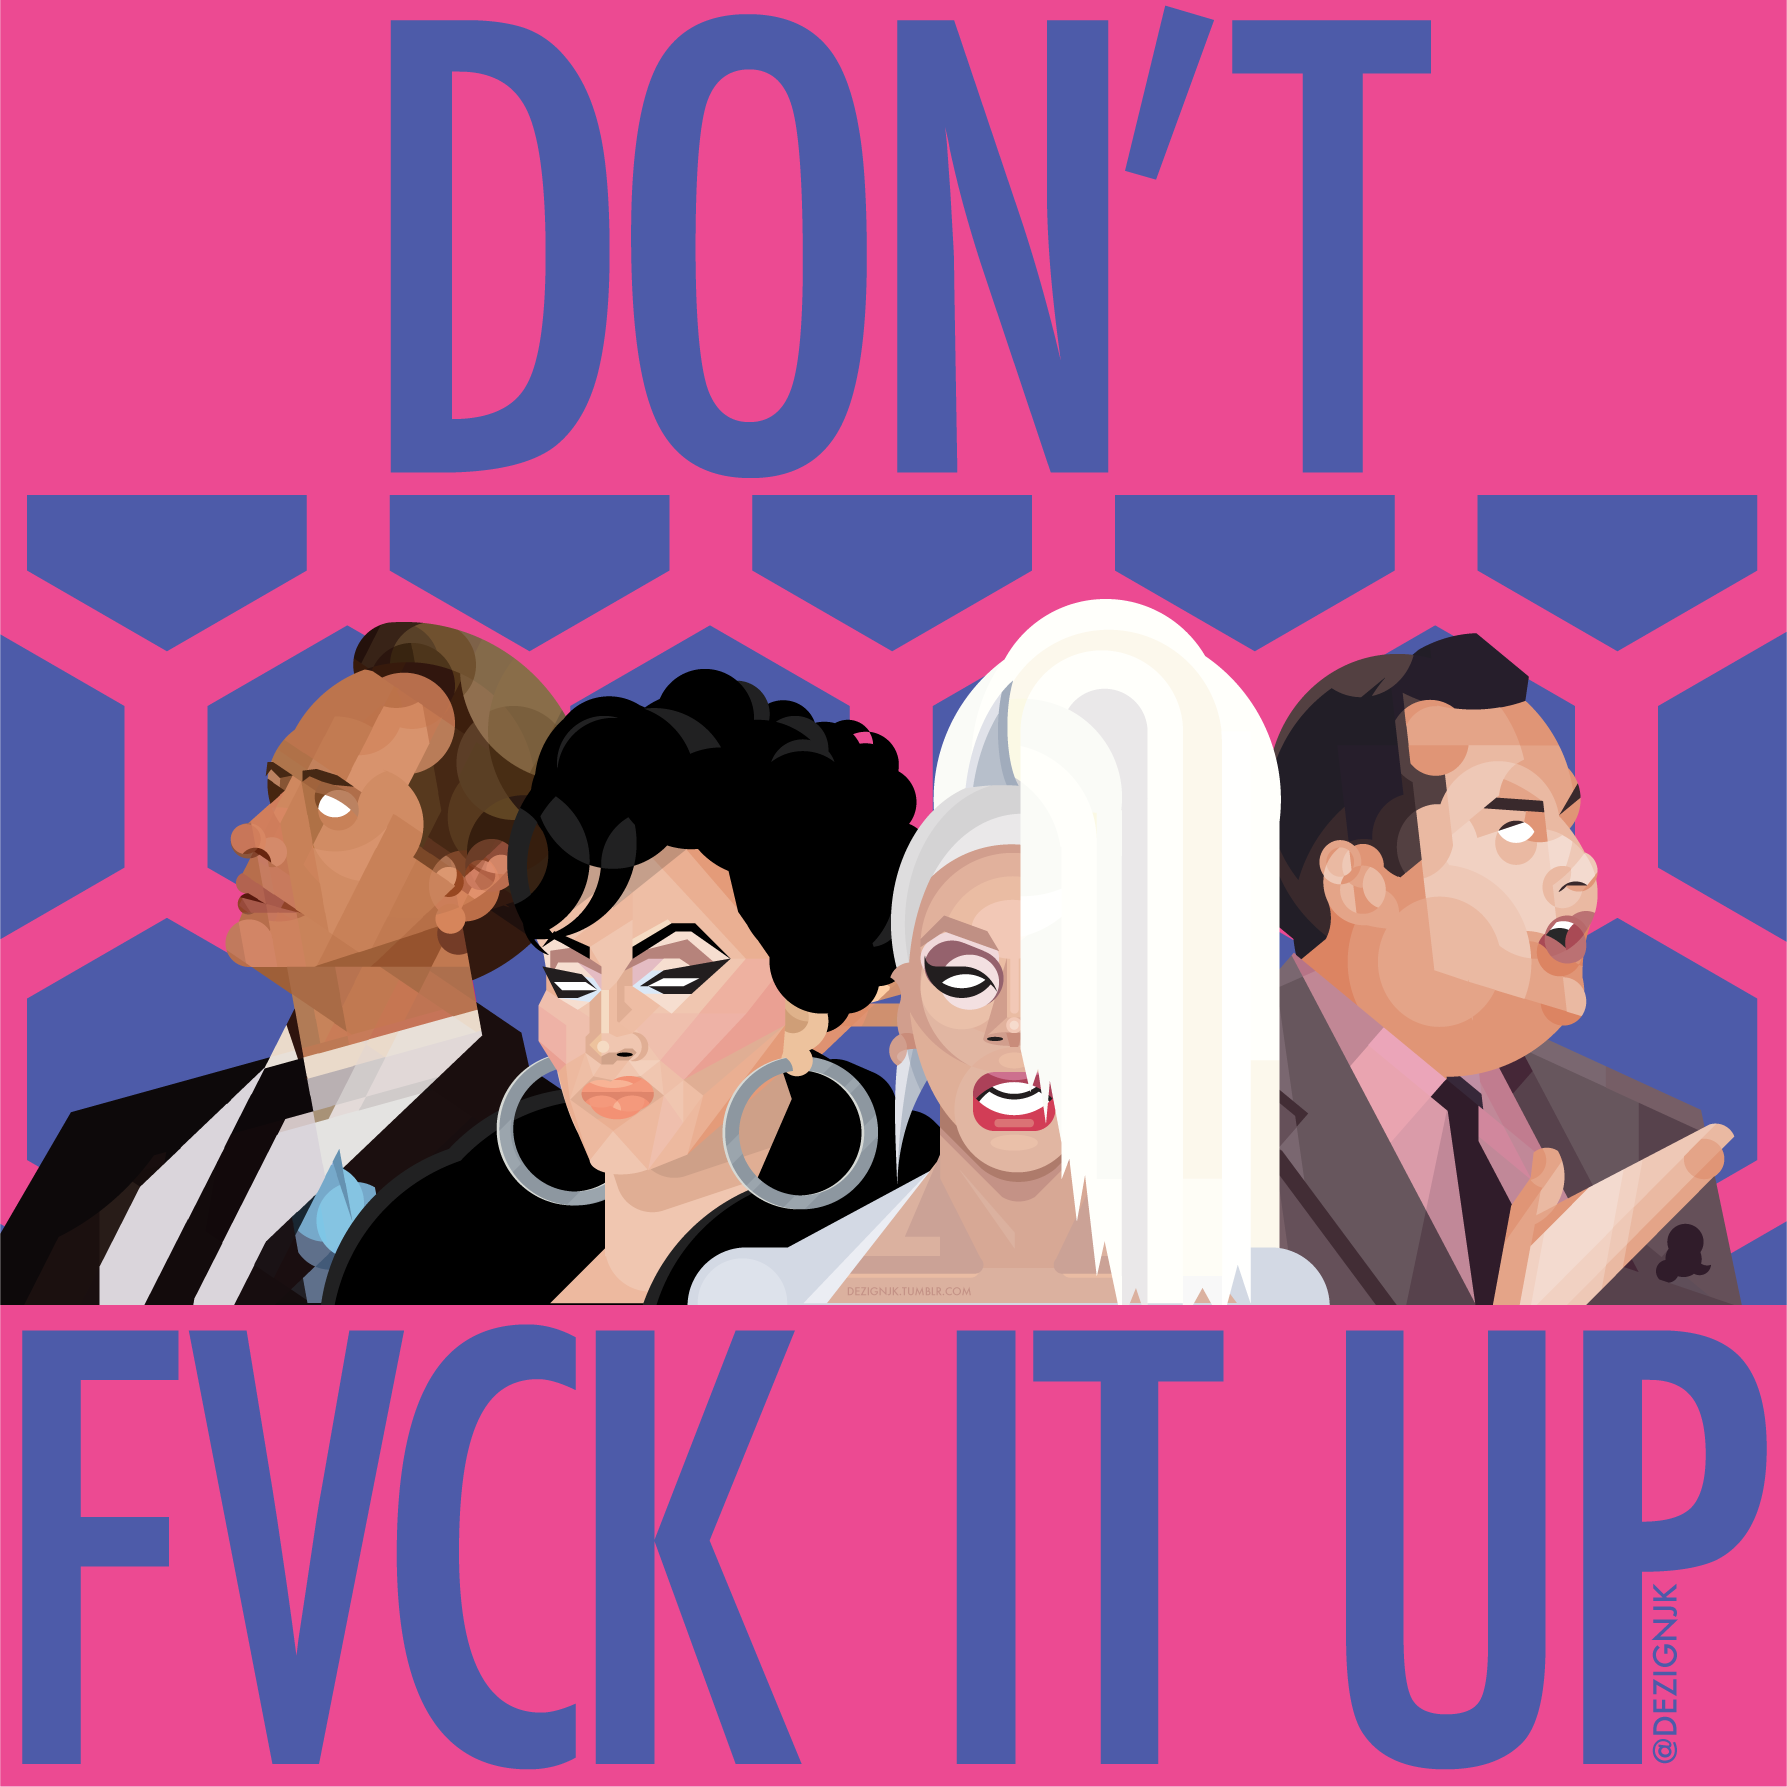 """Don't f*ck it up"" - The (updated) judges of Drag Race: Carson Kressley, Michelle Visage, RuPaul, Ross Mathews"